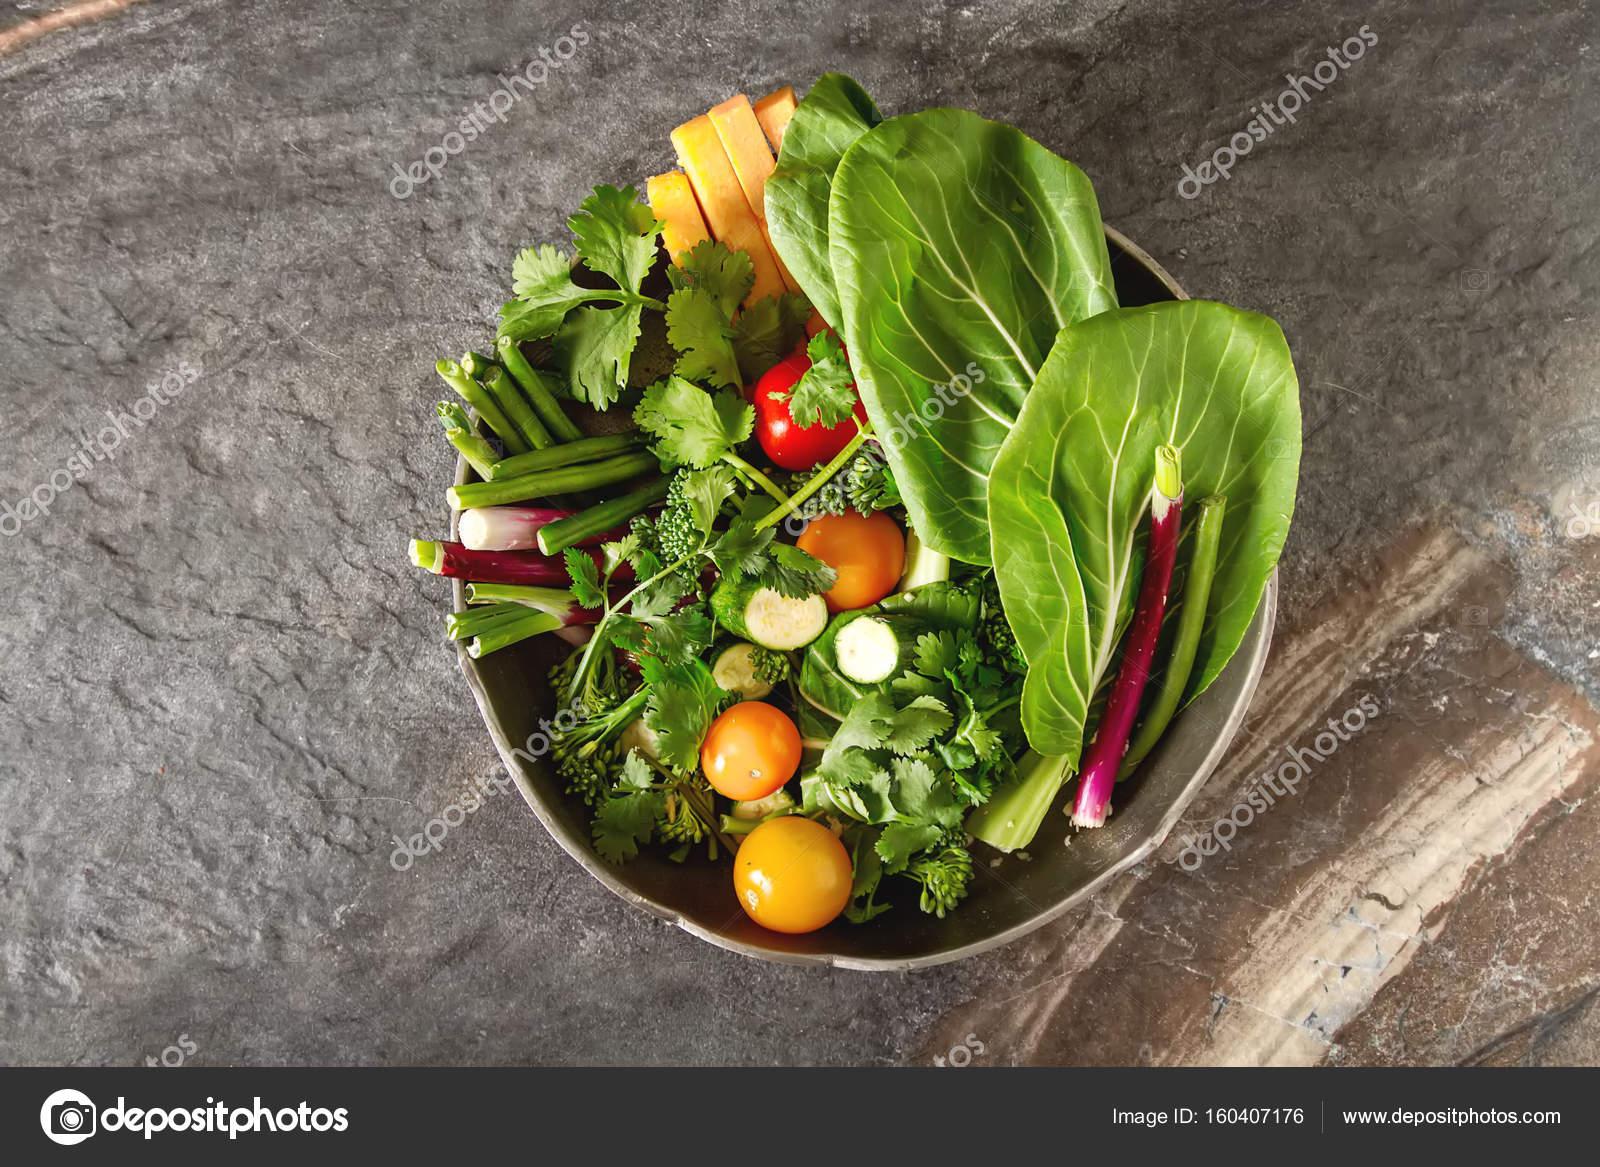 Soğan diyeti